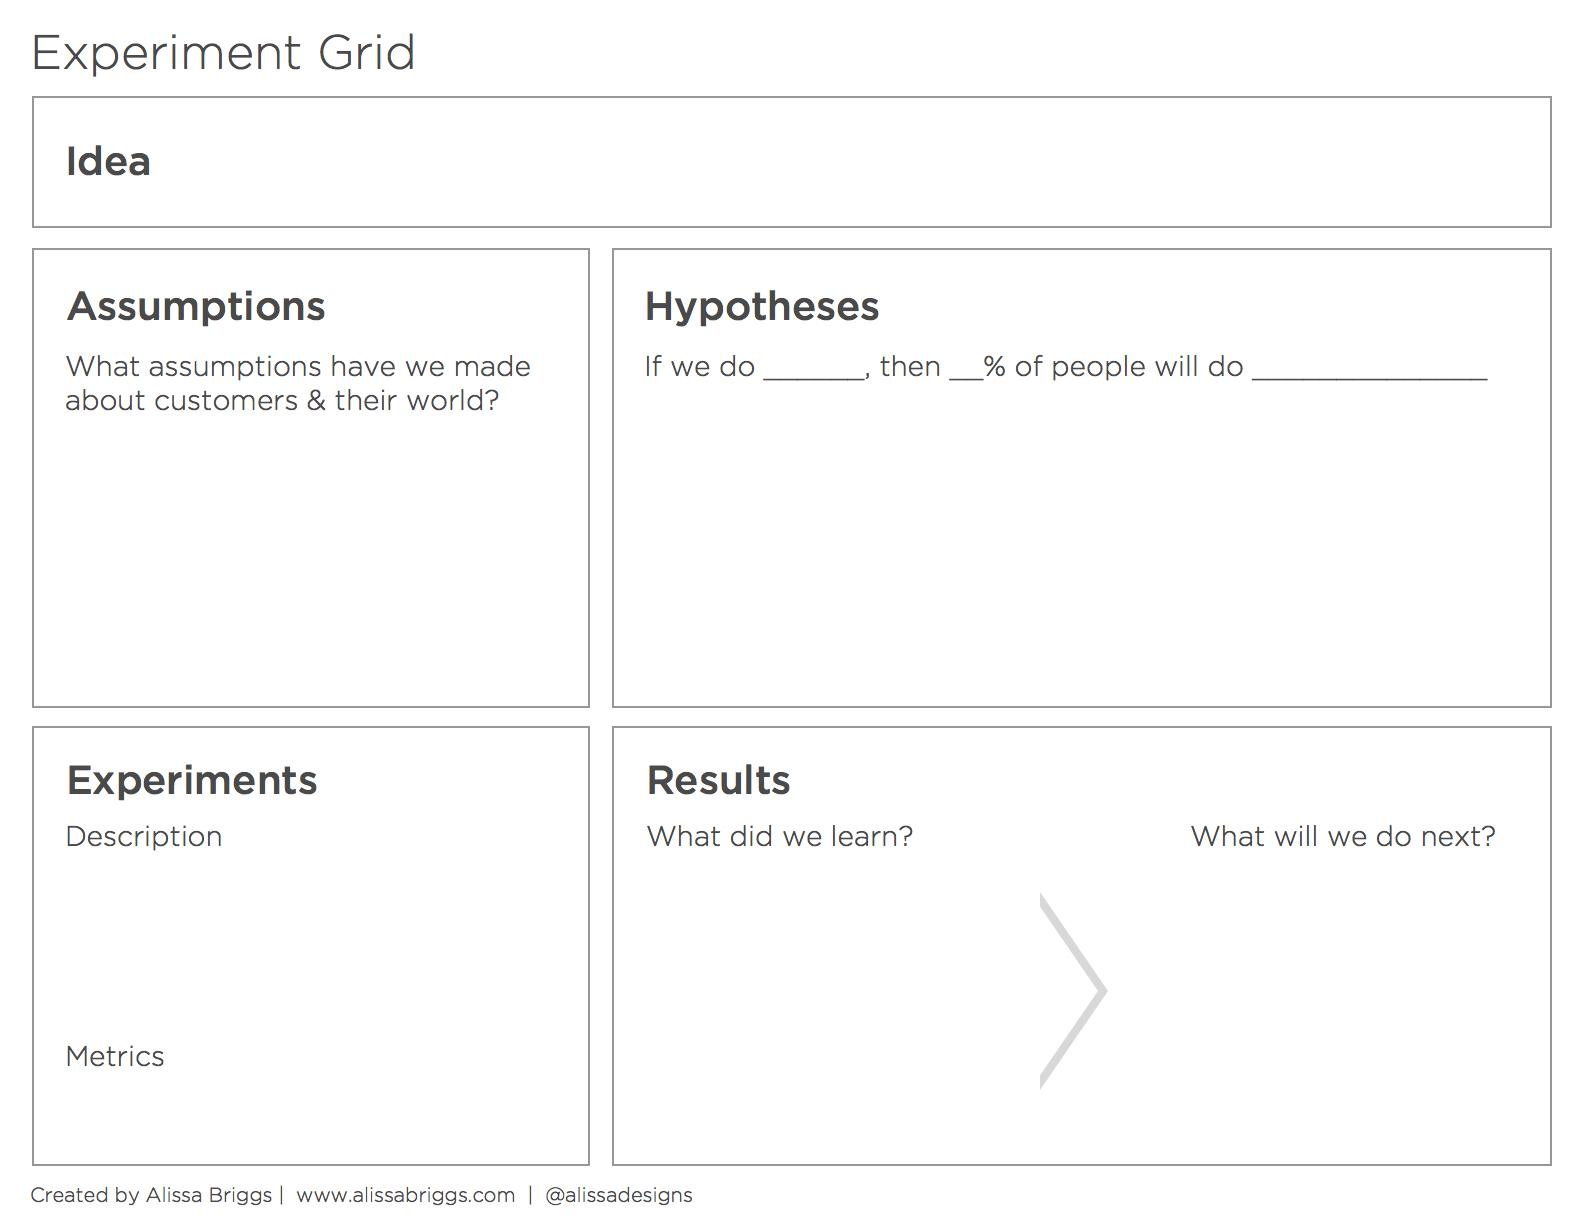 ExperimentGrid